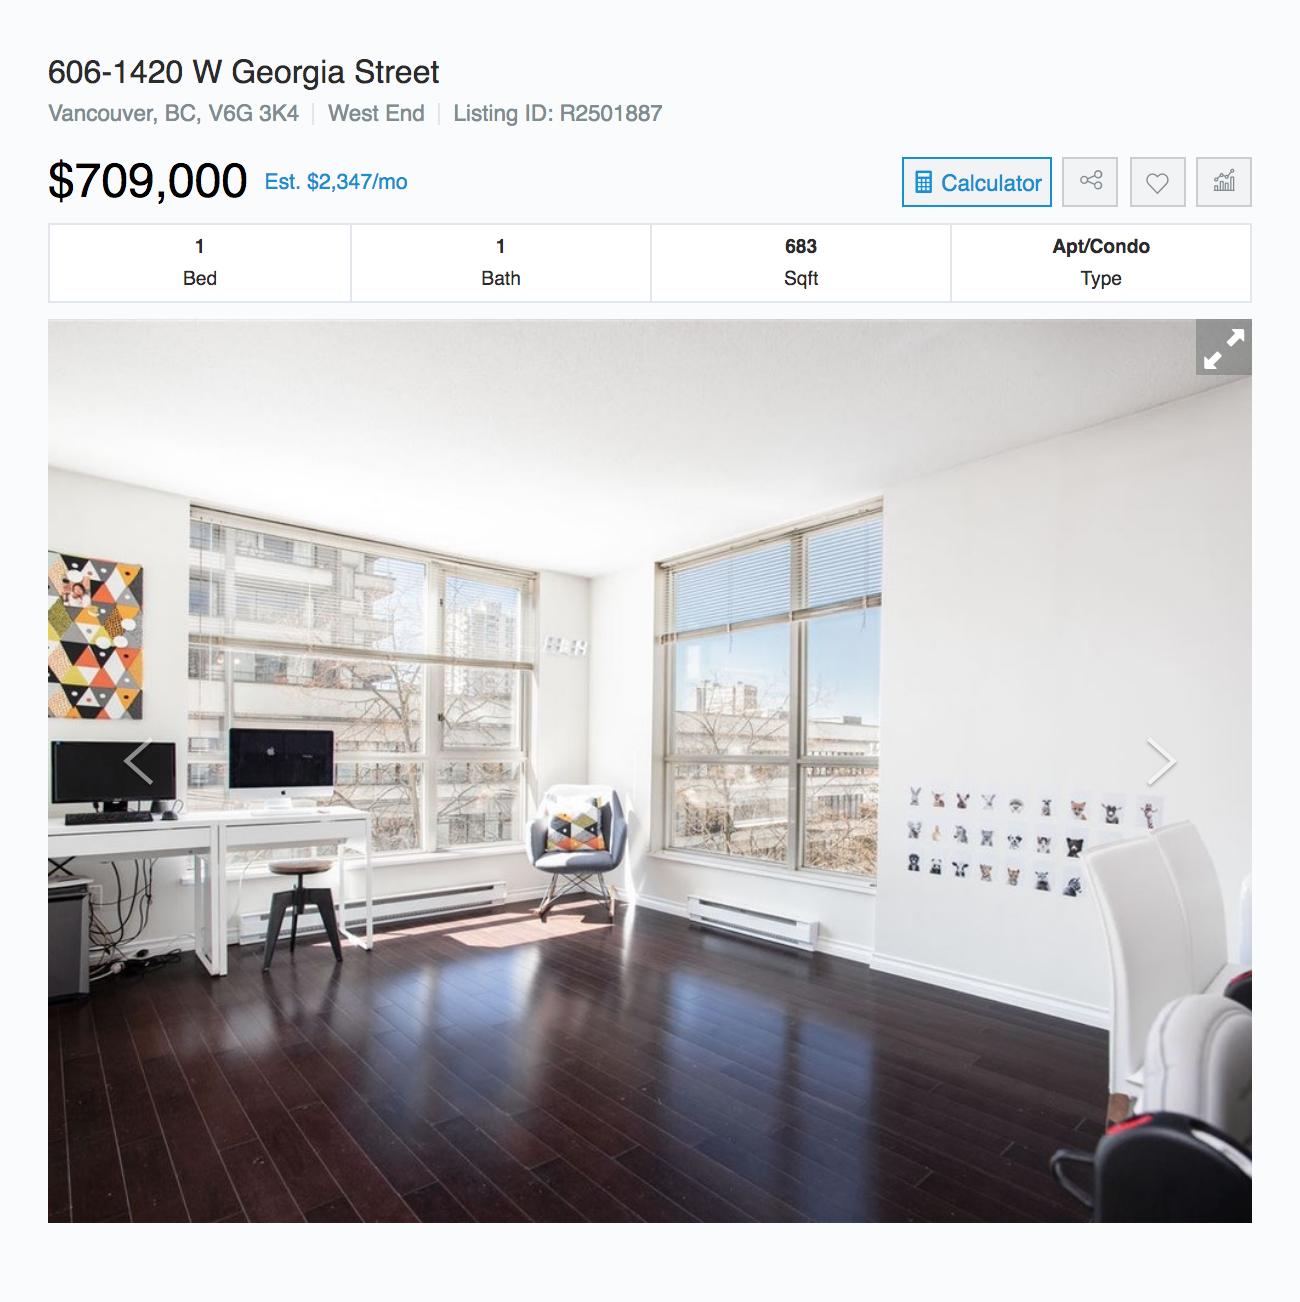 Однокомнатная квартира площадью 63&nbsp;м² в районе Вест-Энд в пяти минутах от океана продается за 709 000&nbsp;CAD (40 413 000&nbsp;<span class=ruble>Р</span>)